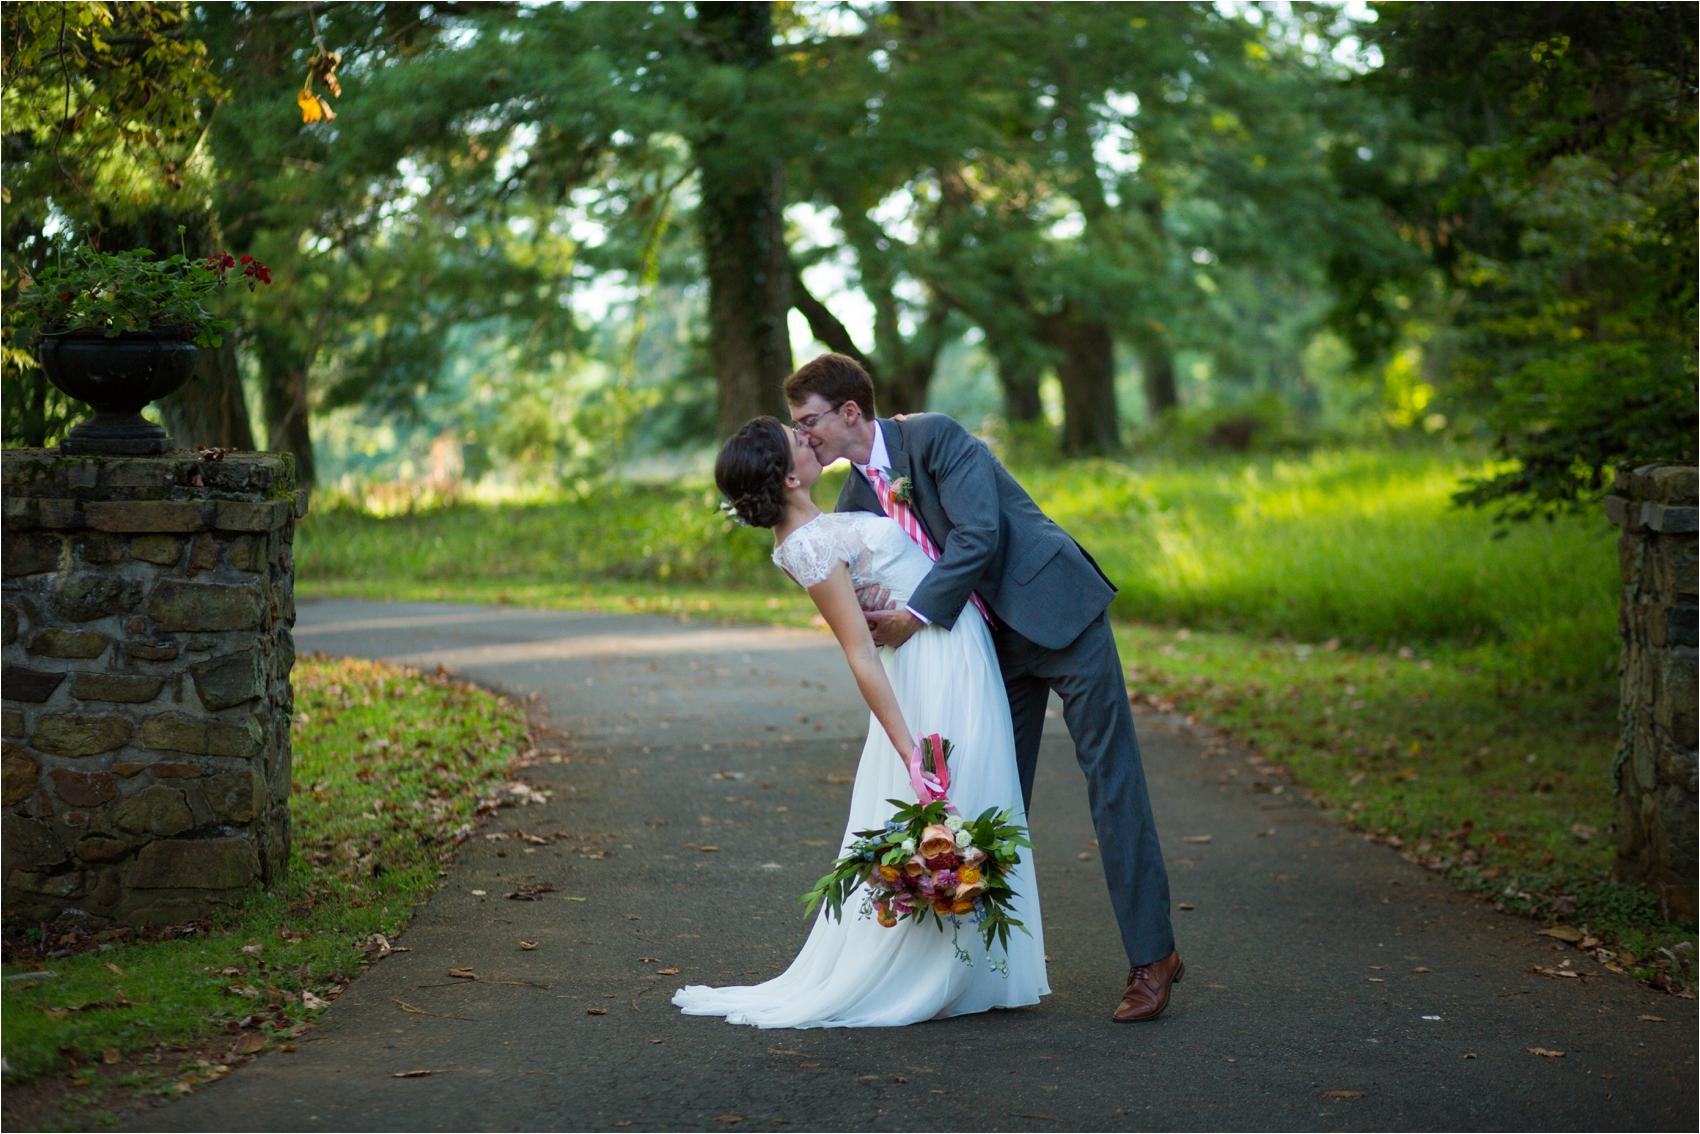 Feather-and-Oak-Rainforest-Trust-Virginia-Wedding-0815.jpg